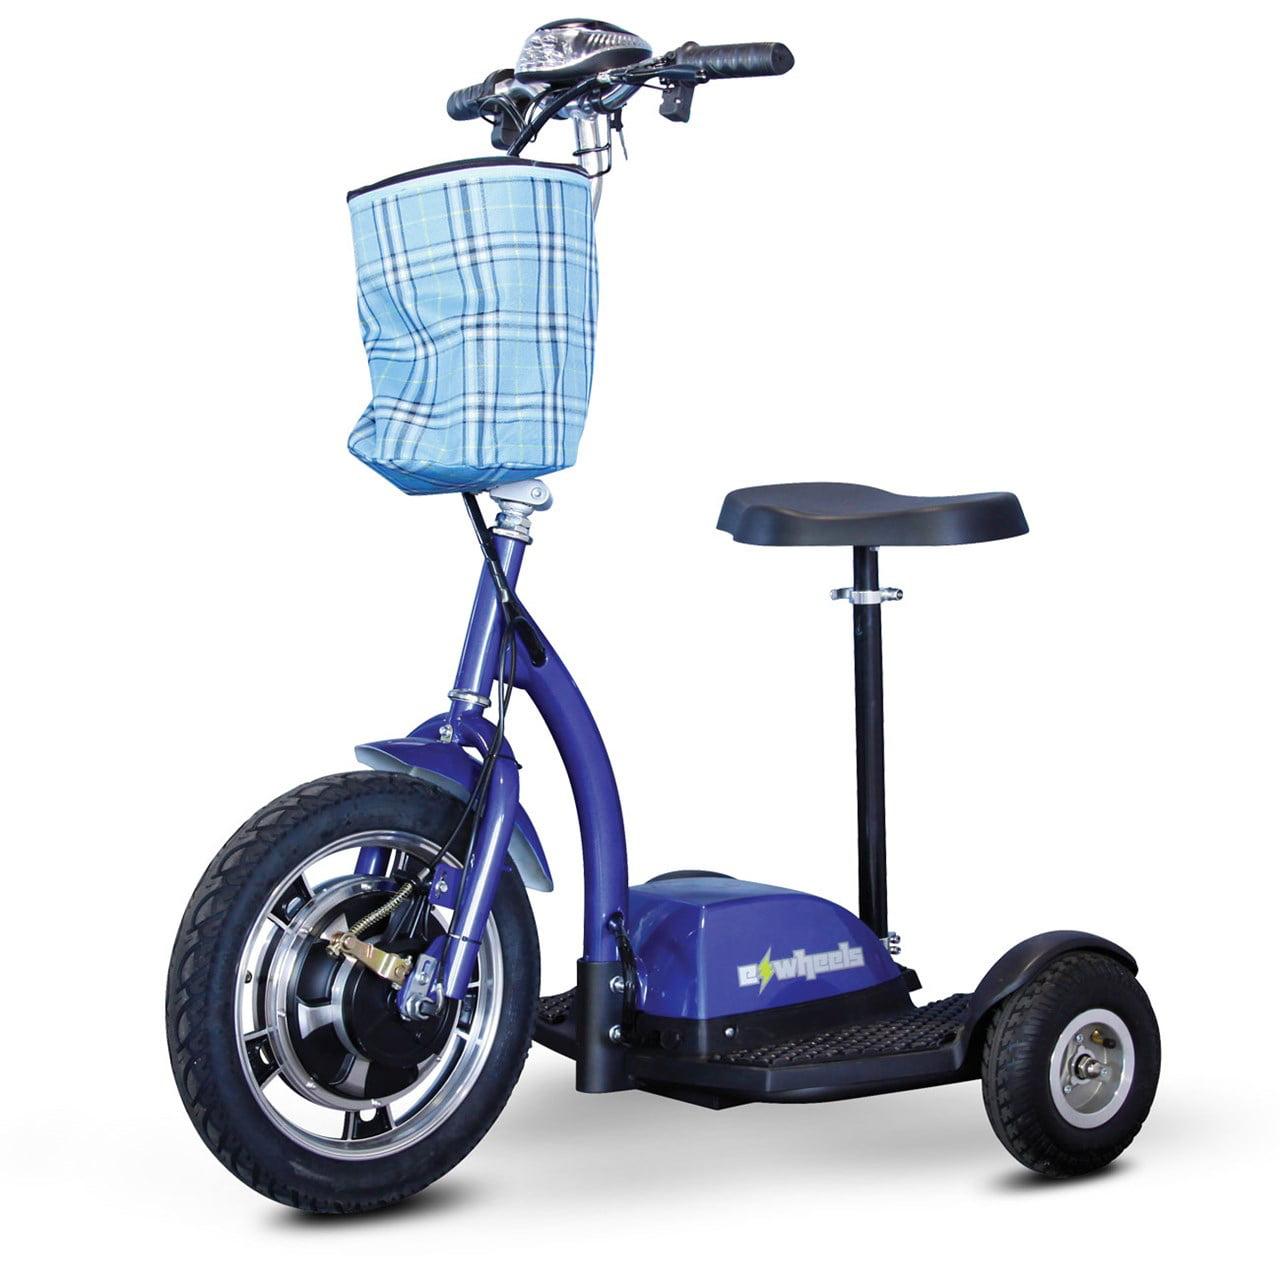 E-Wheels EW-18 Stand-N-Ride 3-Wheel Electric Mobility Sco...